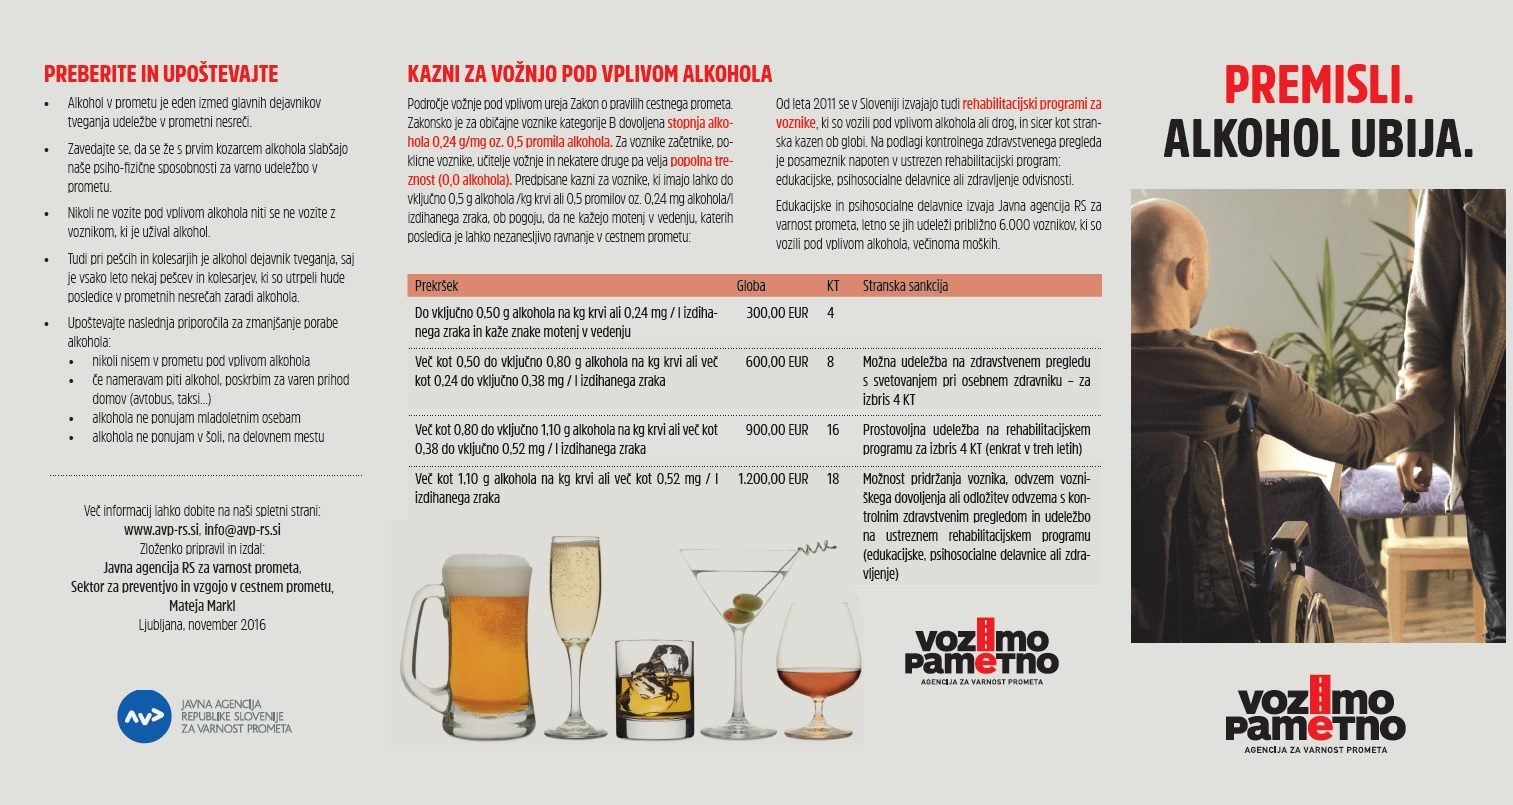 Zloženka Premisli. Alkohol ubija.